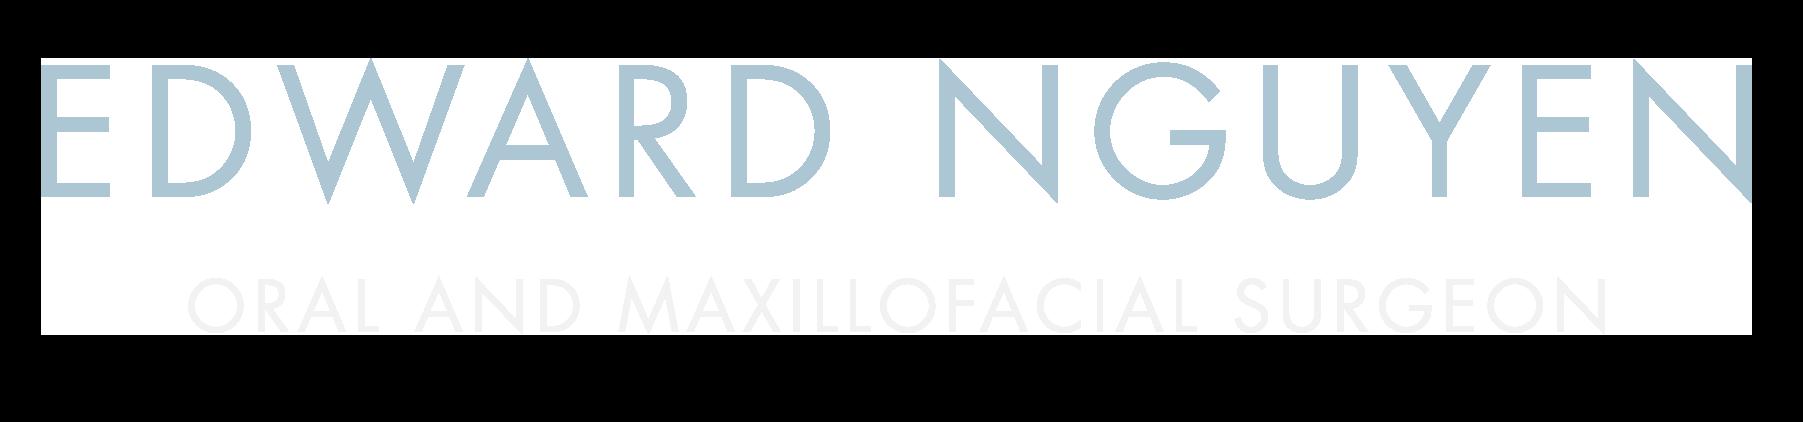 Edward Nguyen Text Logo